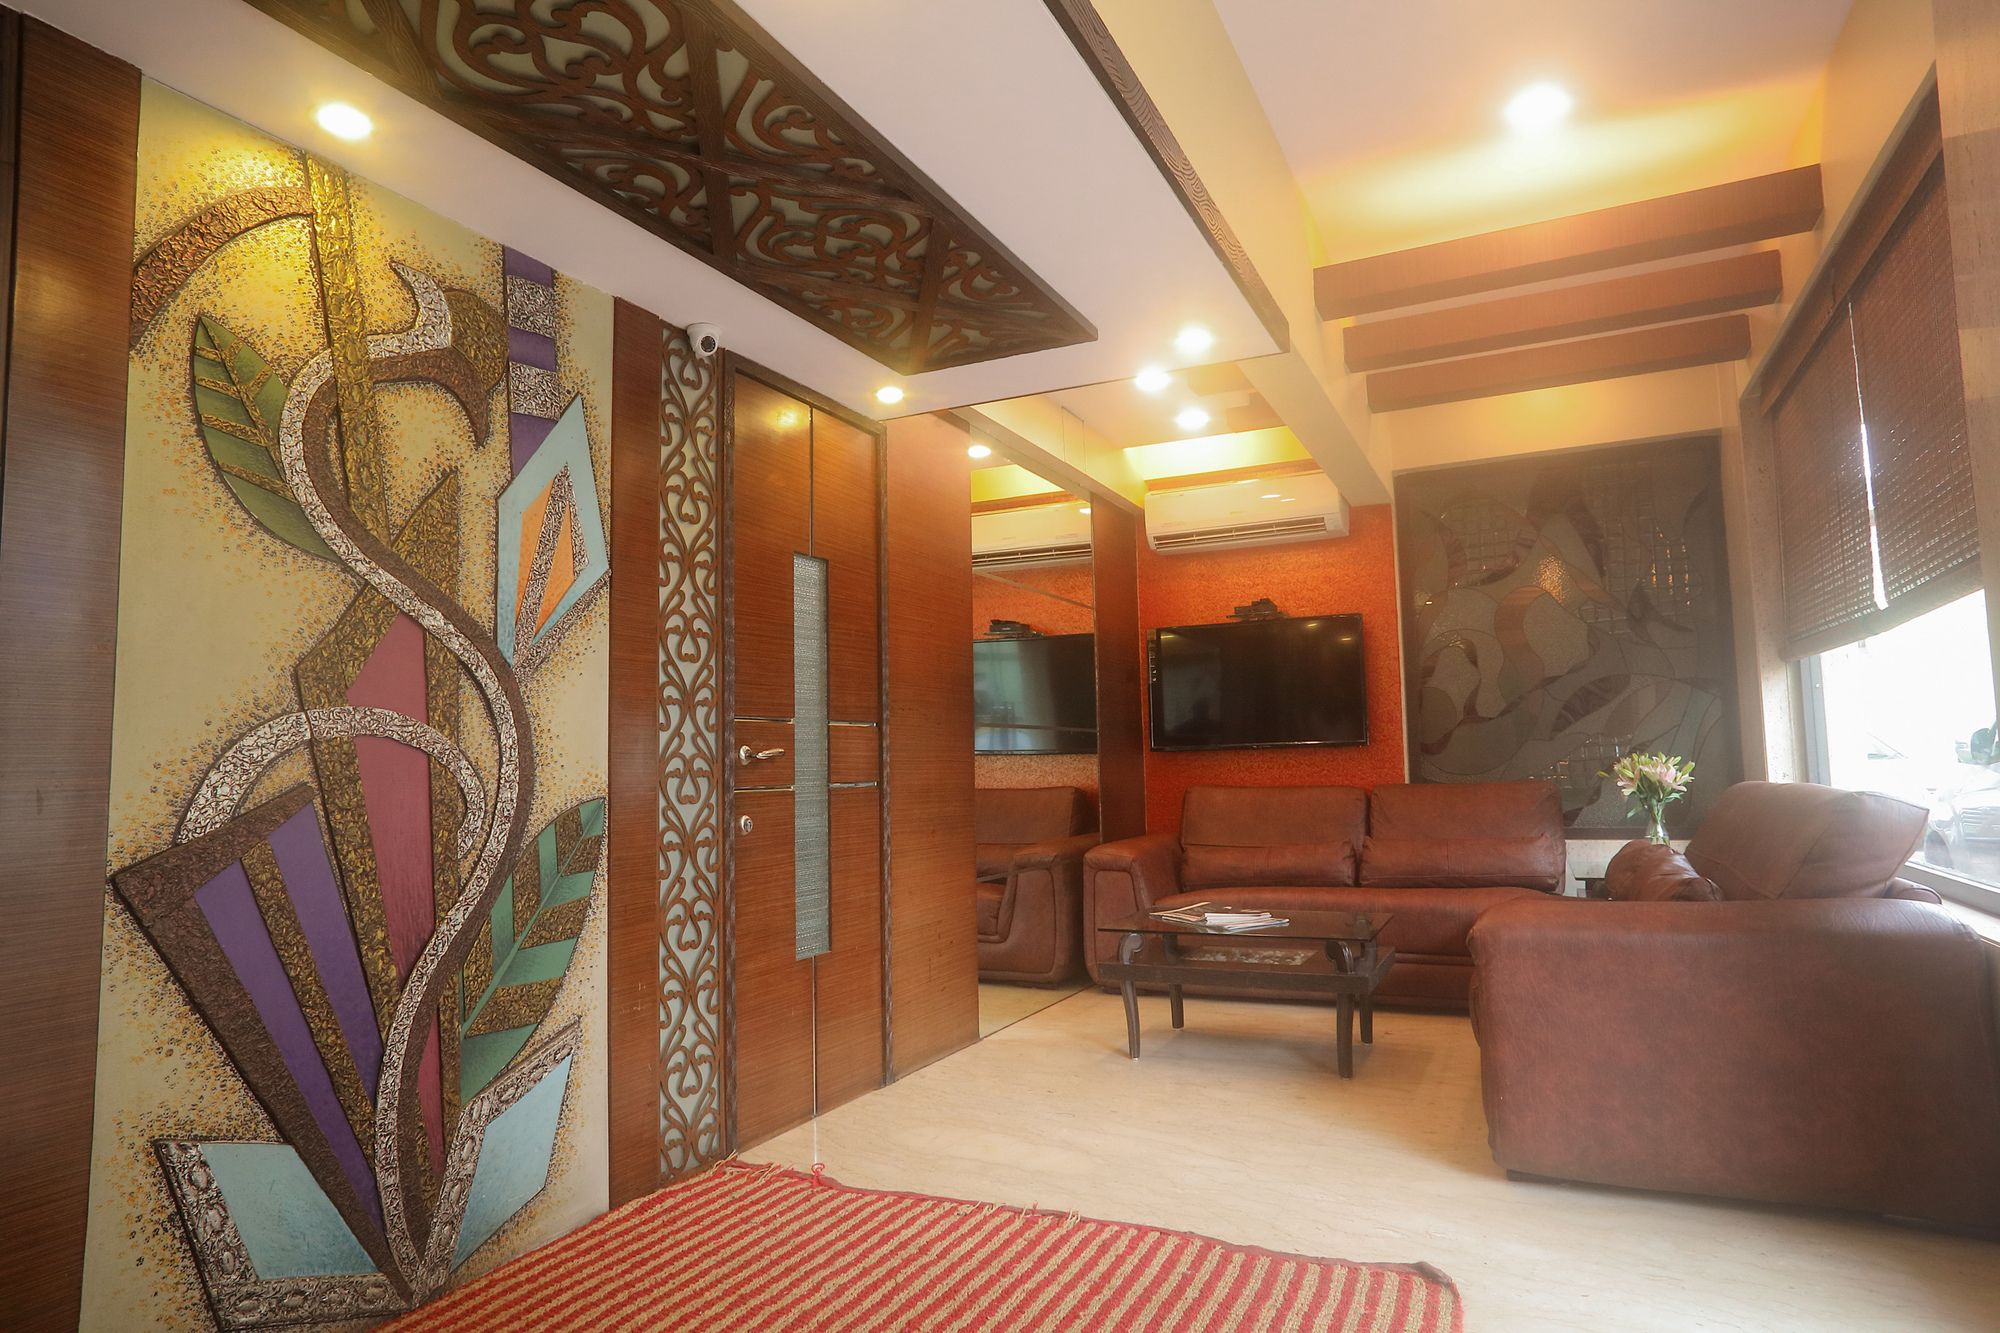 OYO Rooms 569 Mumbai Central Station